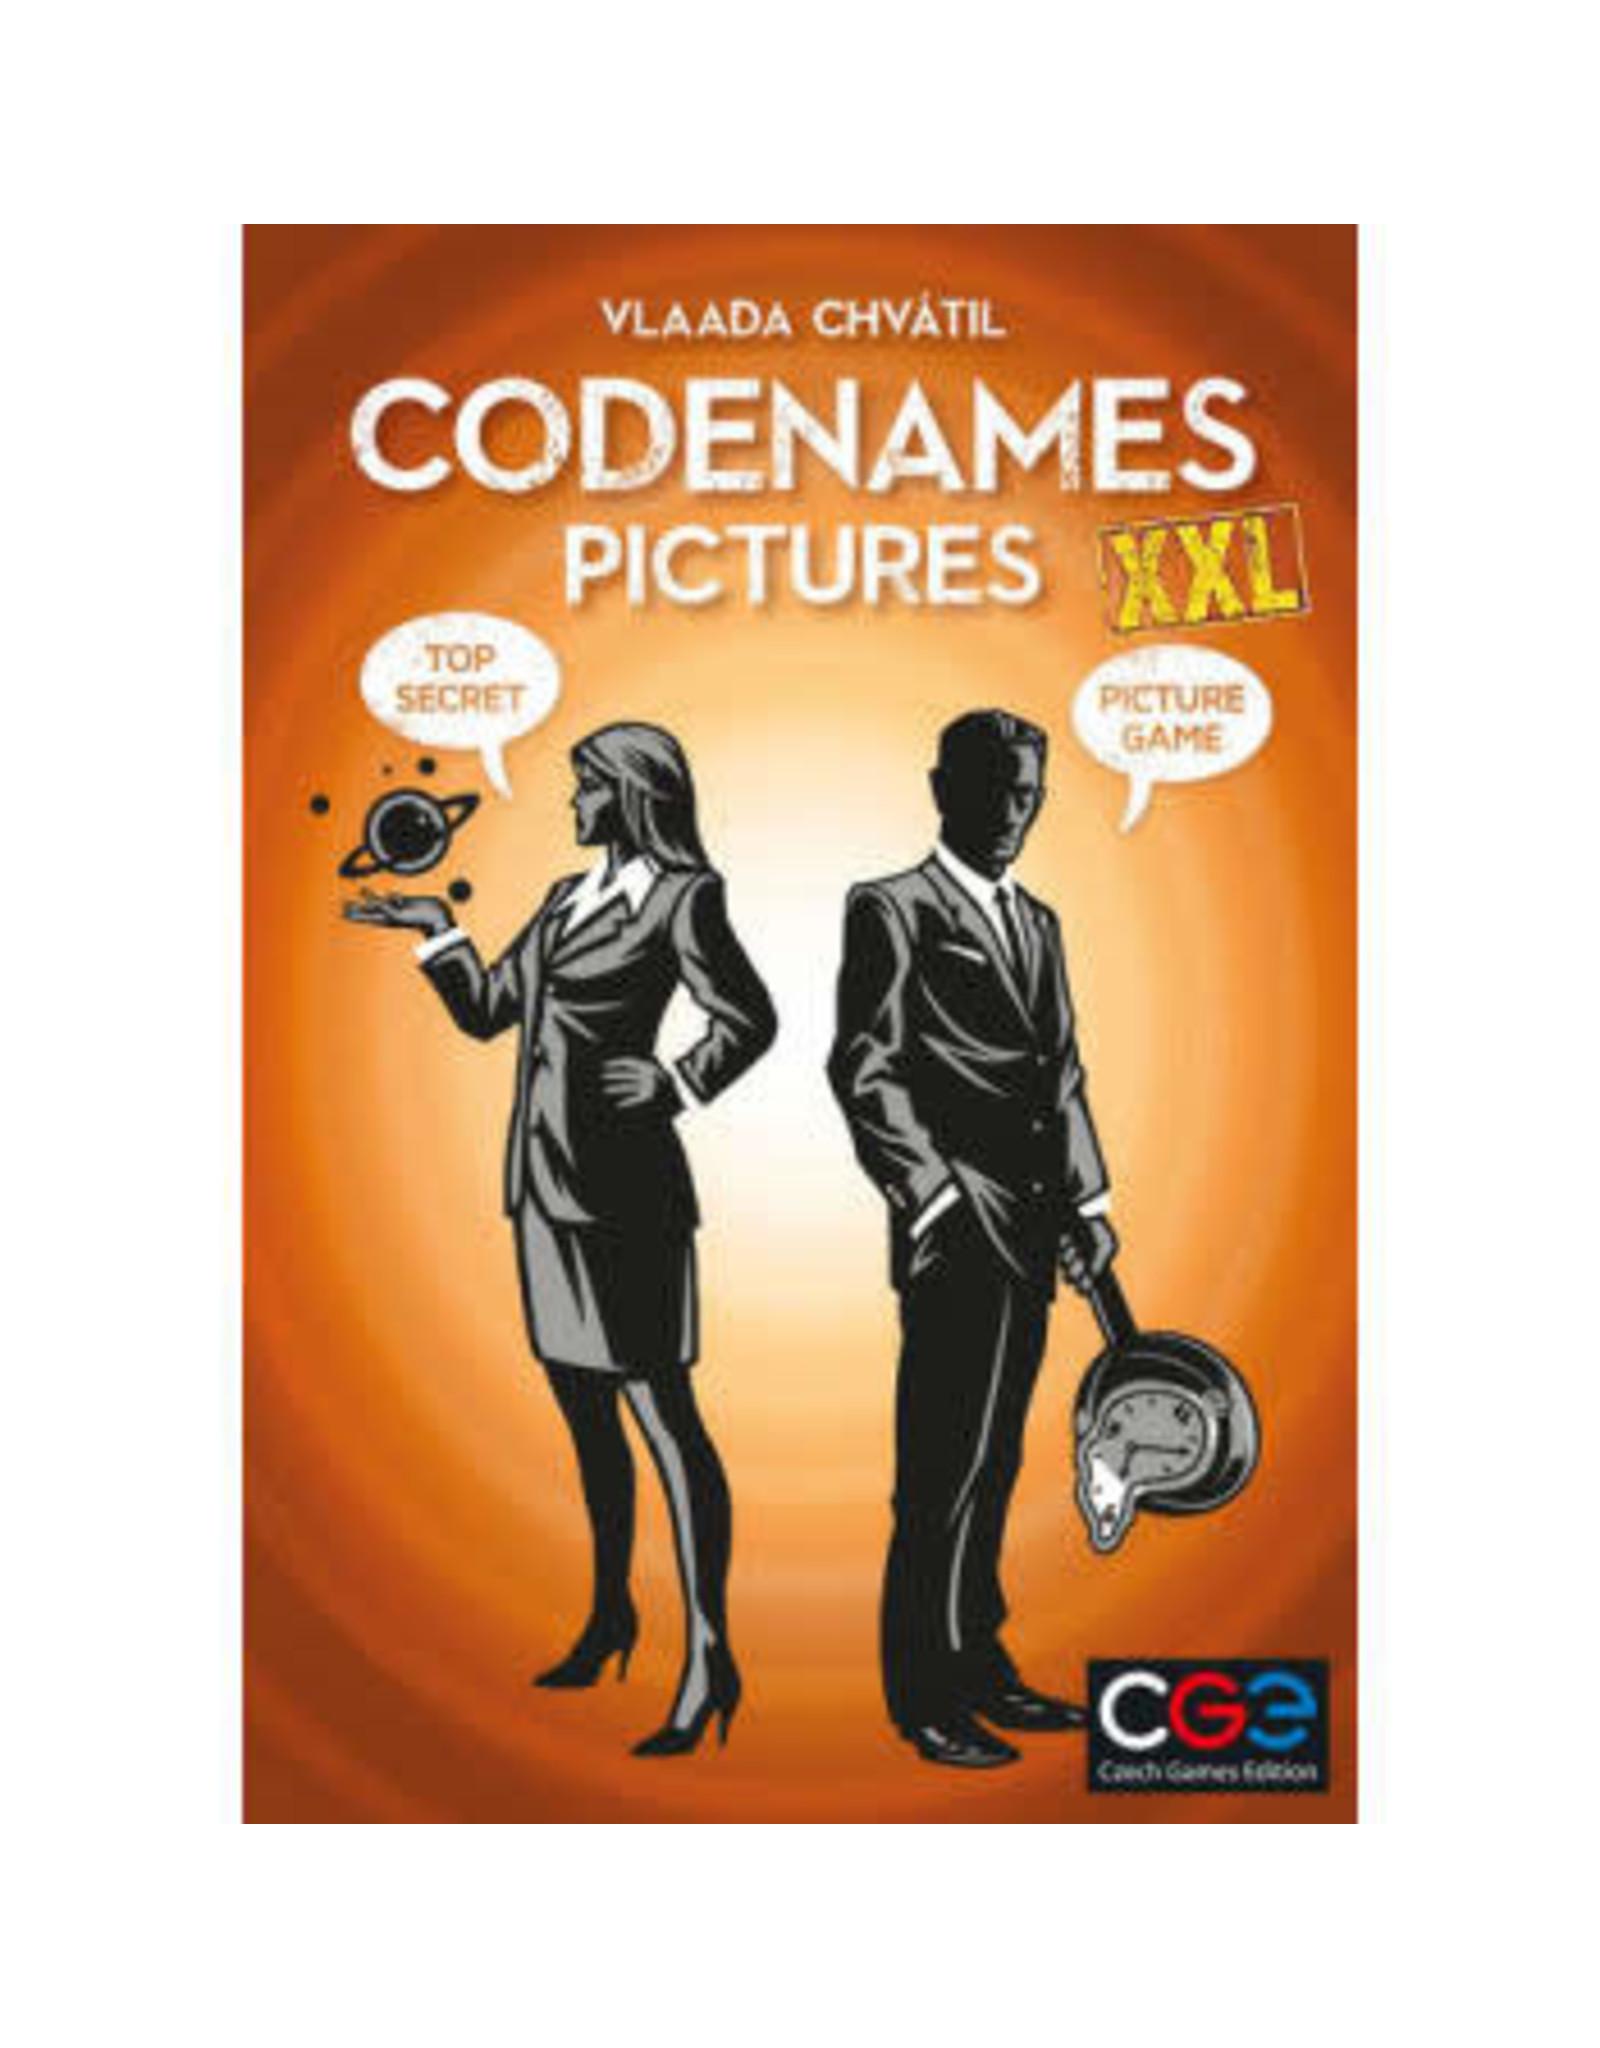 Czech Games Edition Codenames Pictures XXL